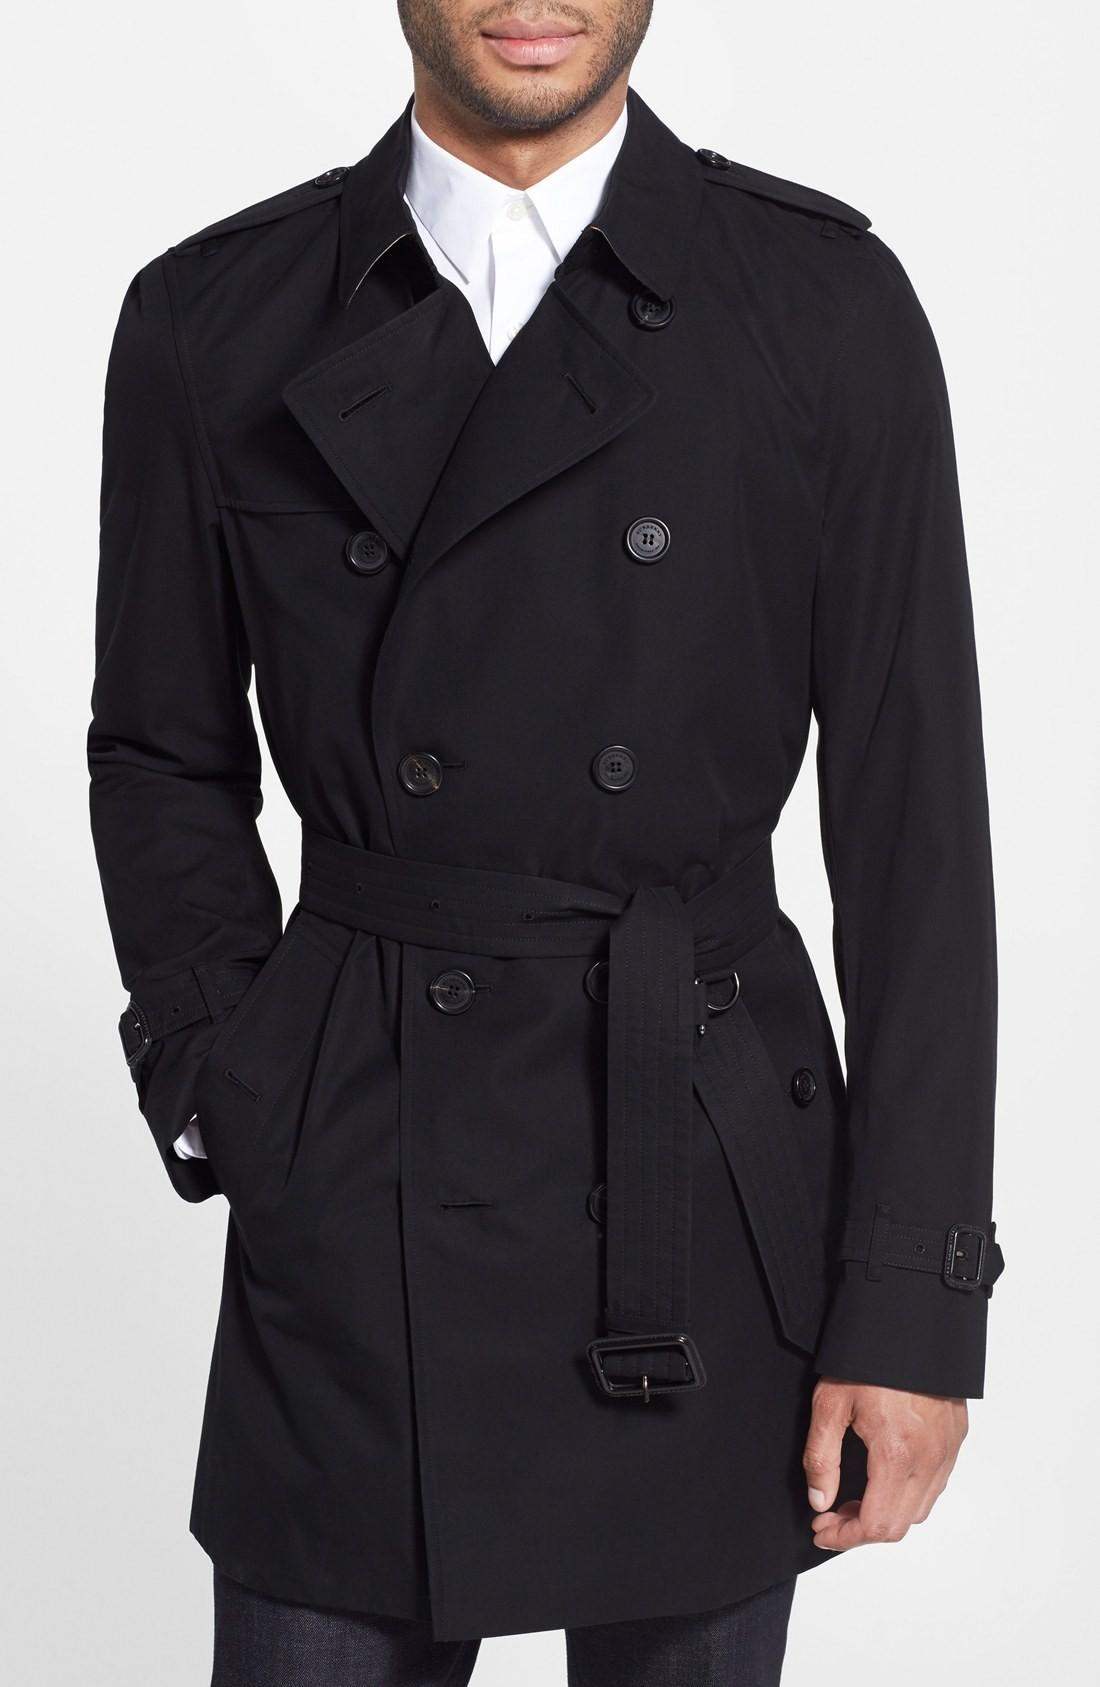 Burberry Overcoat Mens | Mens Shearling Overcoat | Mens Overcoats